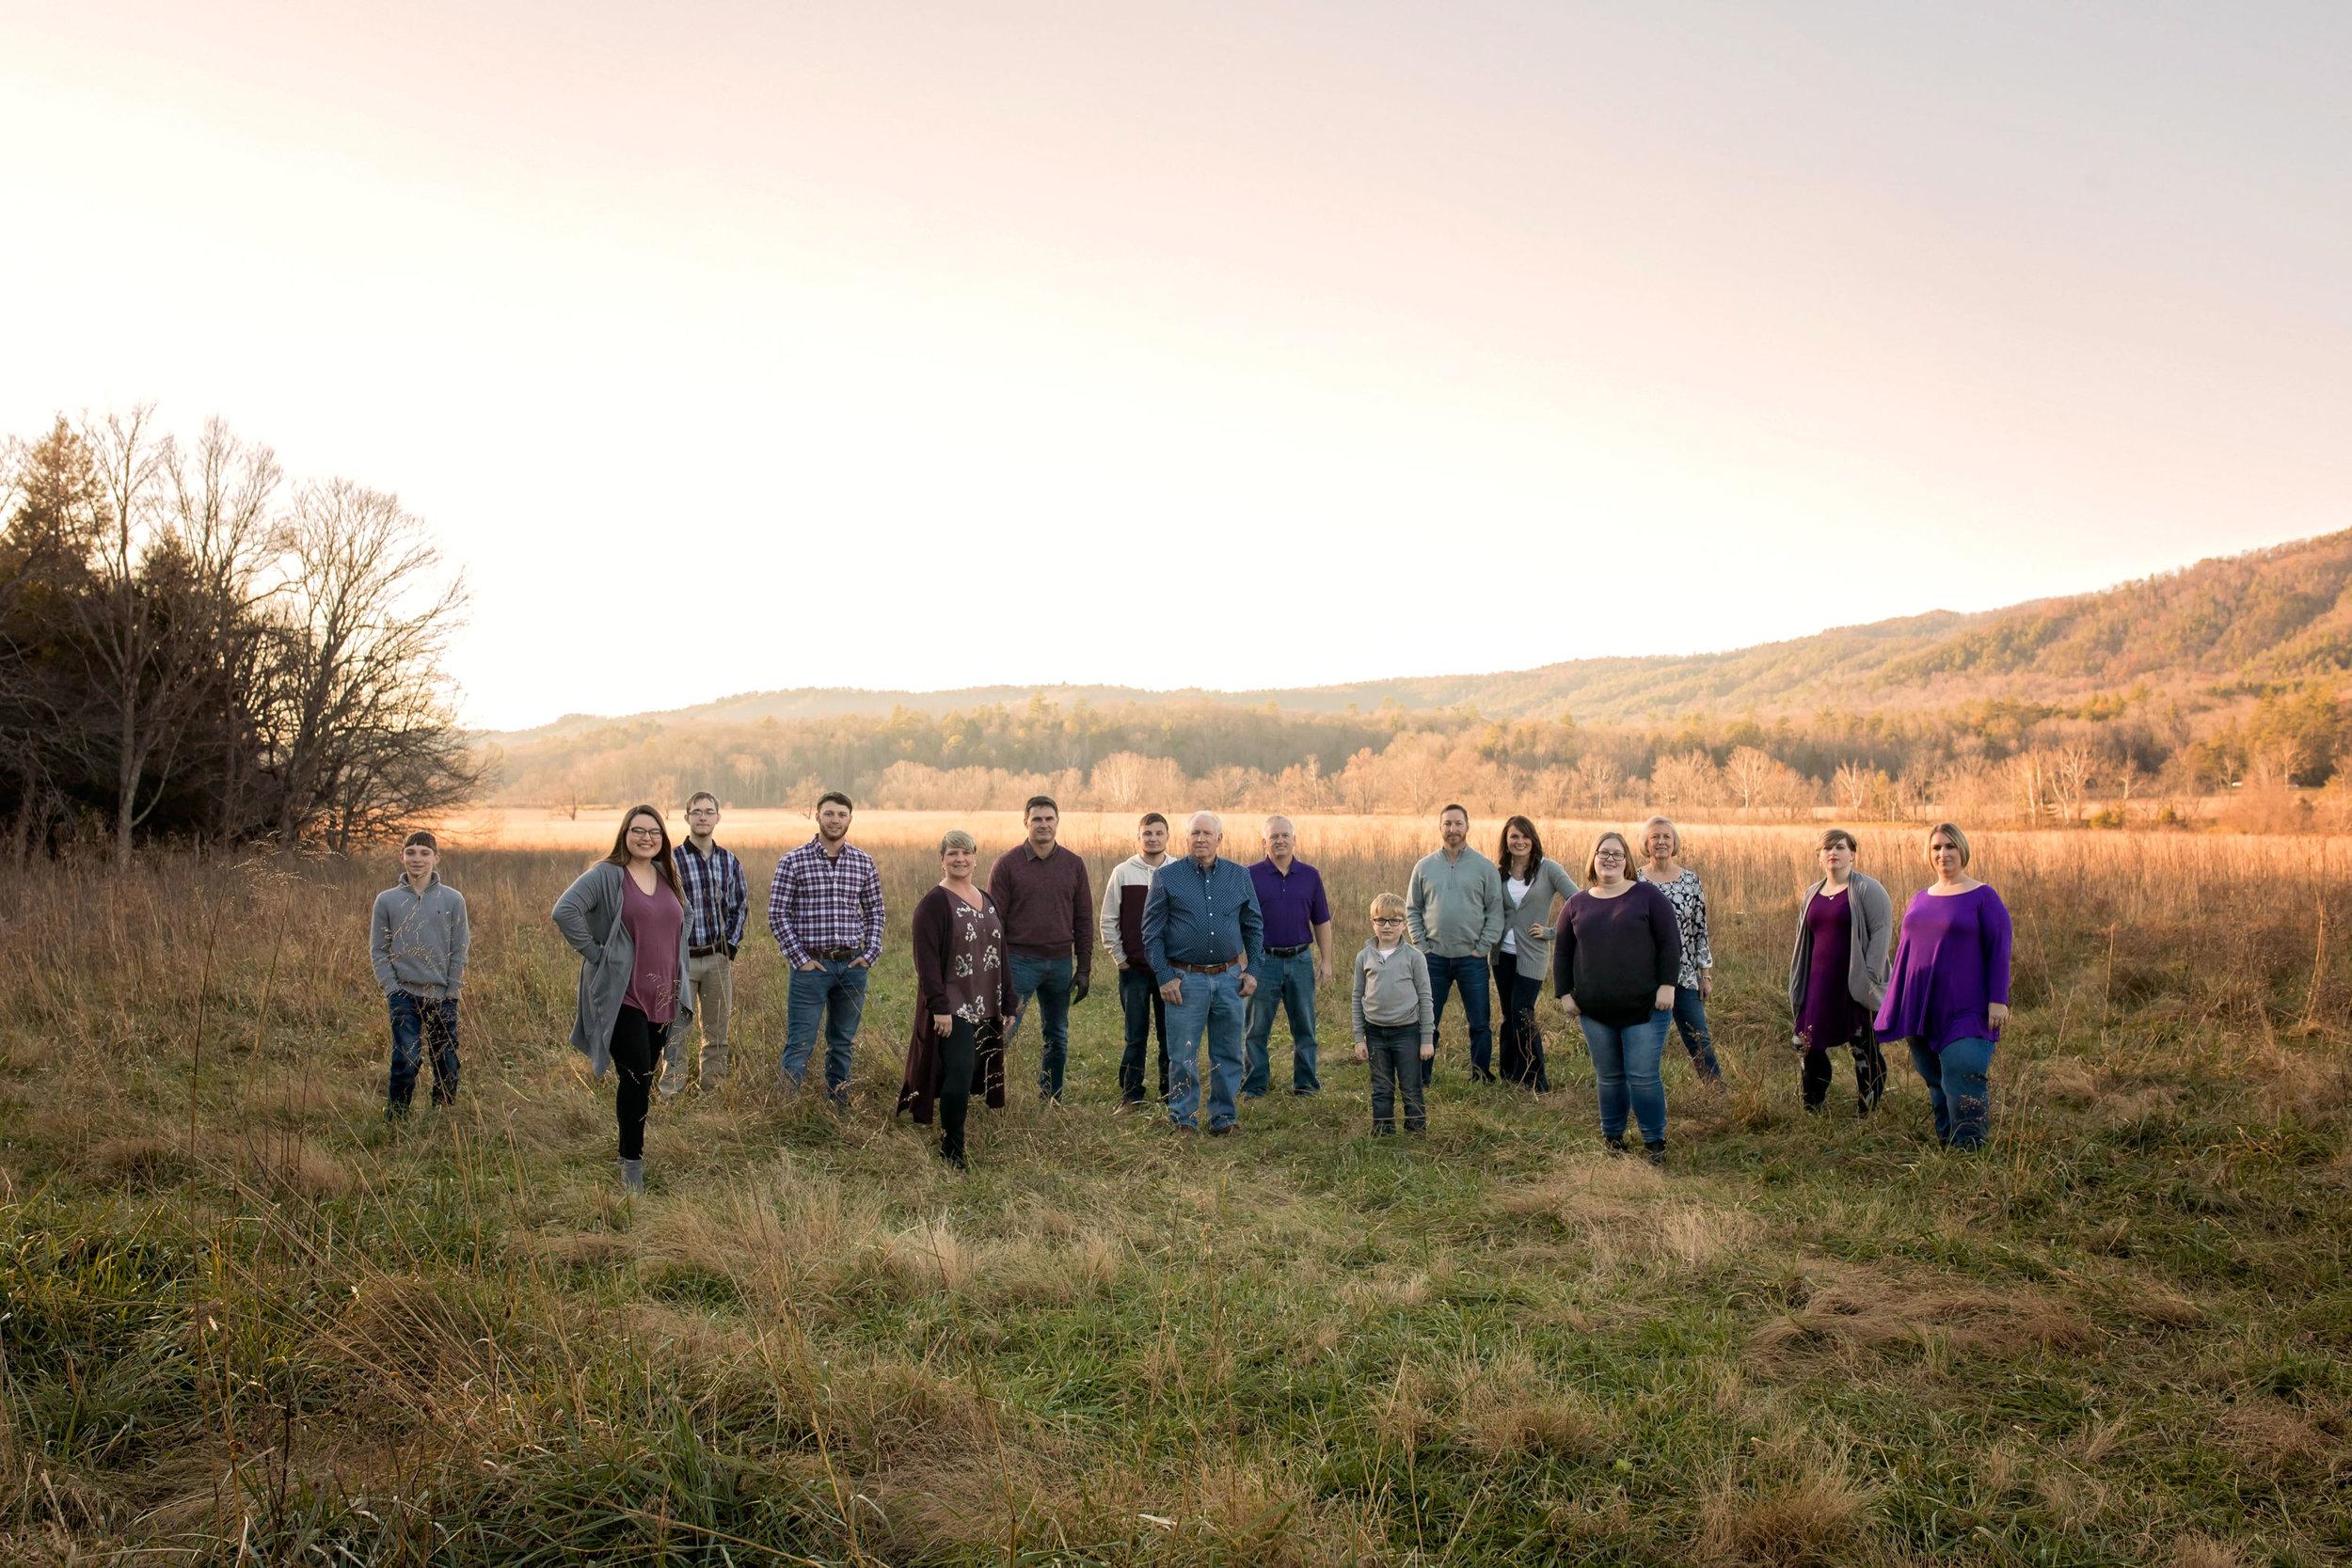 gatlinburg-family-reunion-photographhy-extended-family.jpg